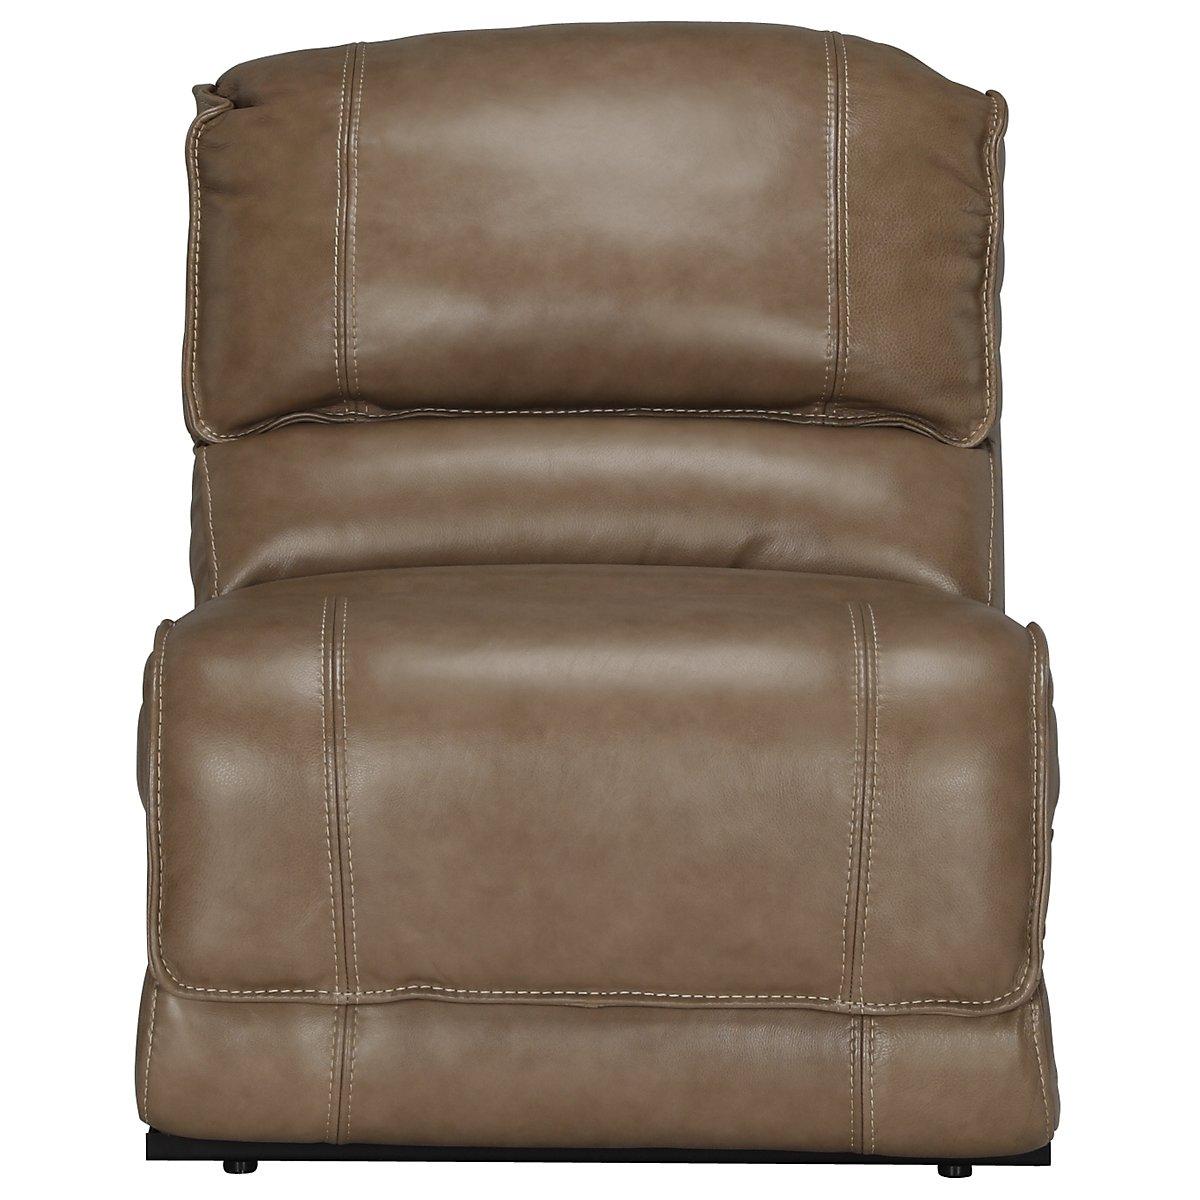 benson dk taupe lthr vinyl r chaise pwr rec sec. Black Bedroom Furniture Sets. Home Design Ideas